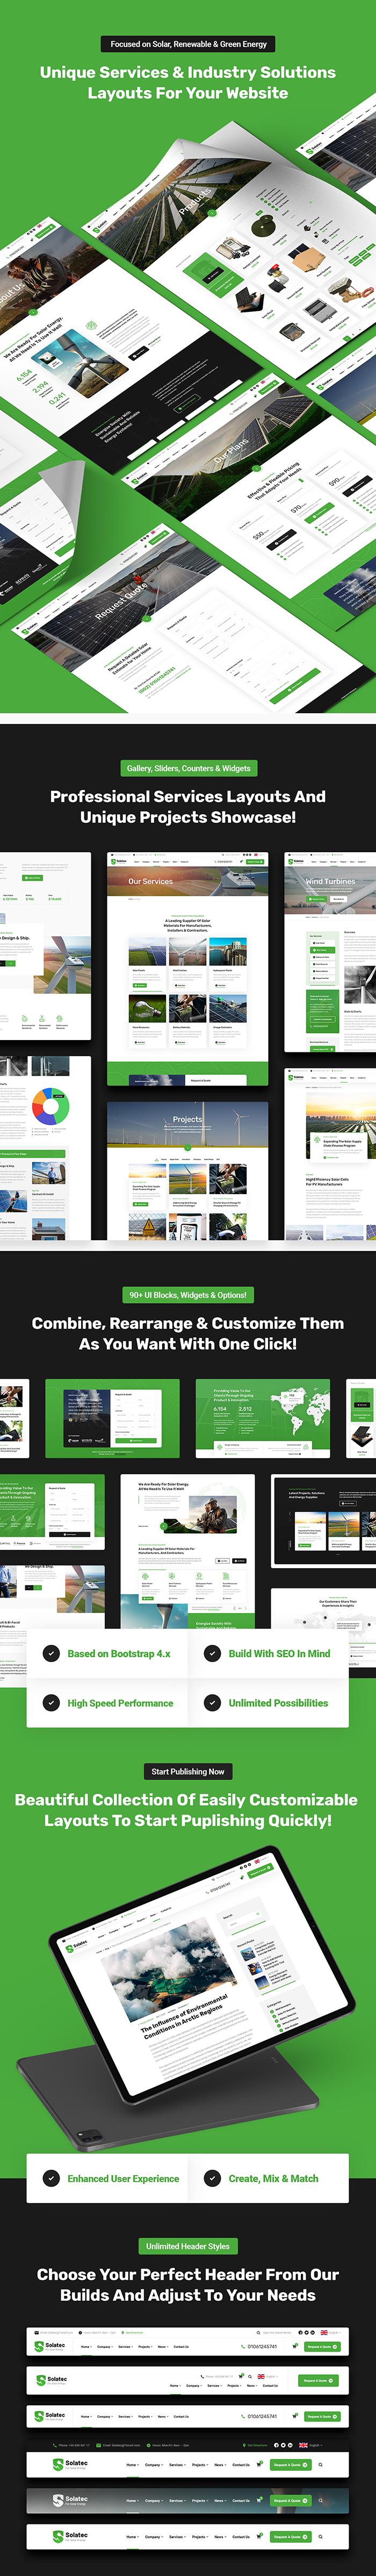 Solatec - Ecology & Solar Energy HTML5 Template - 6